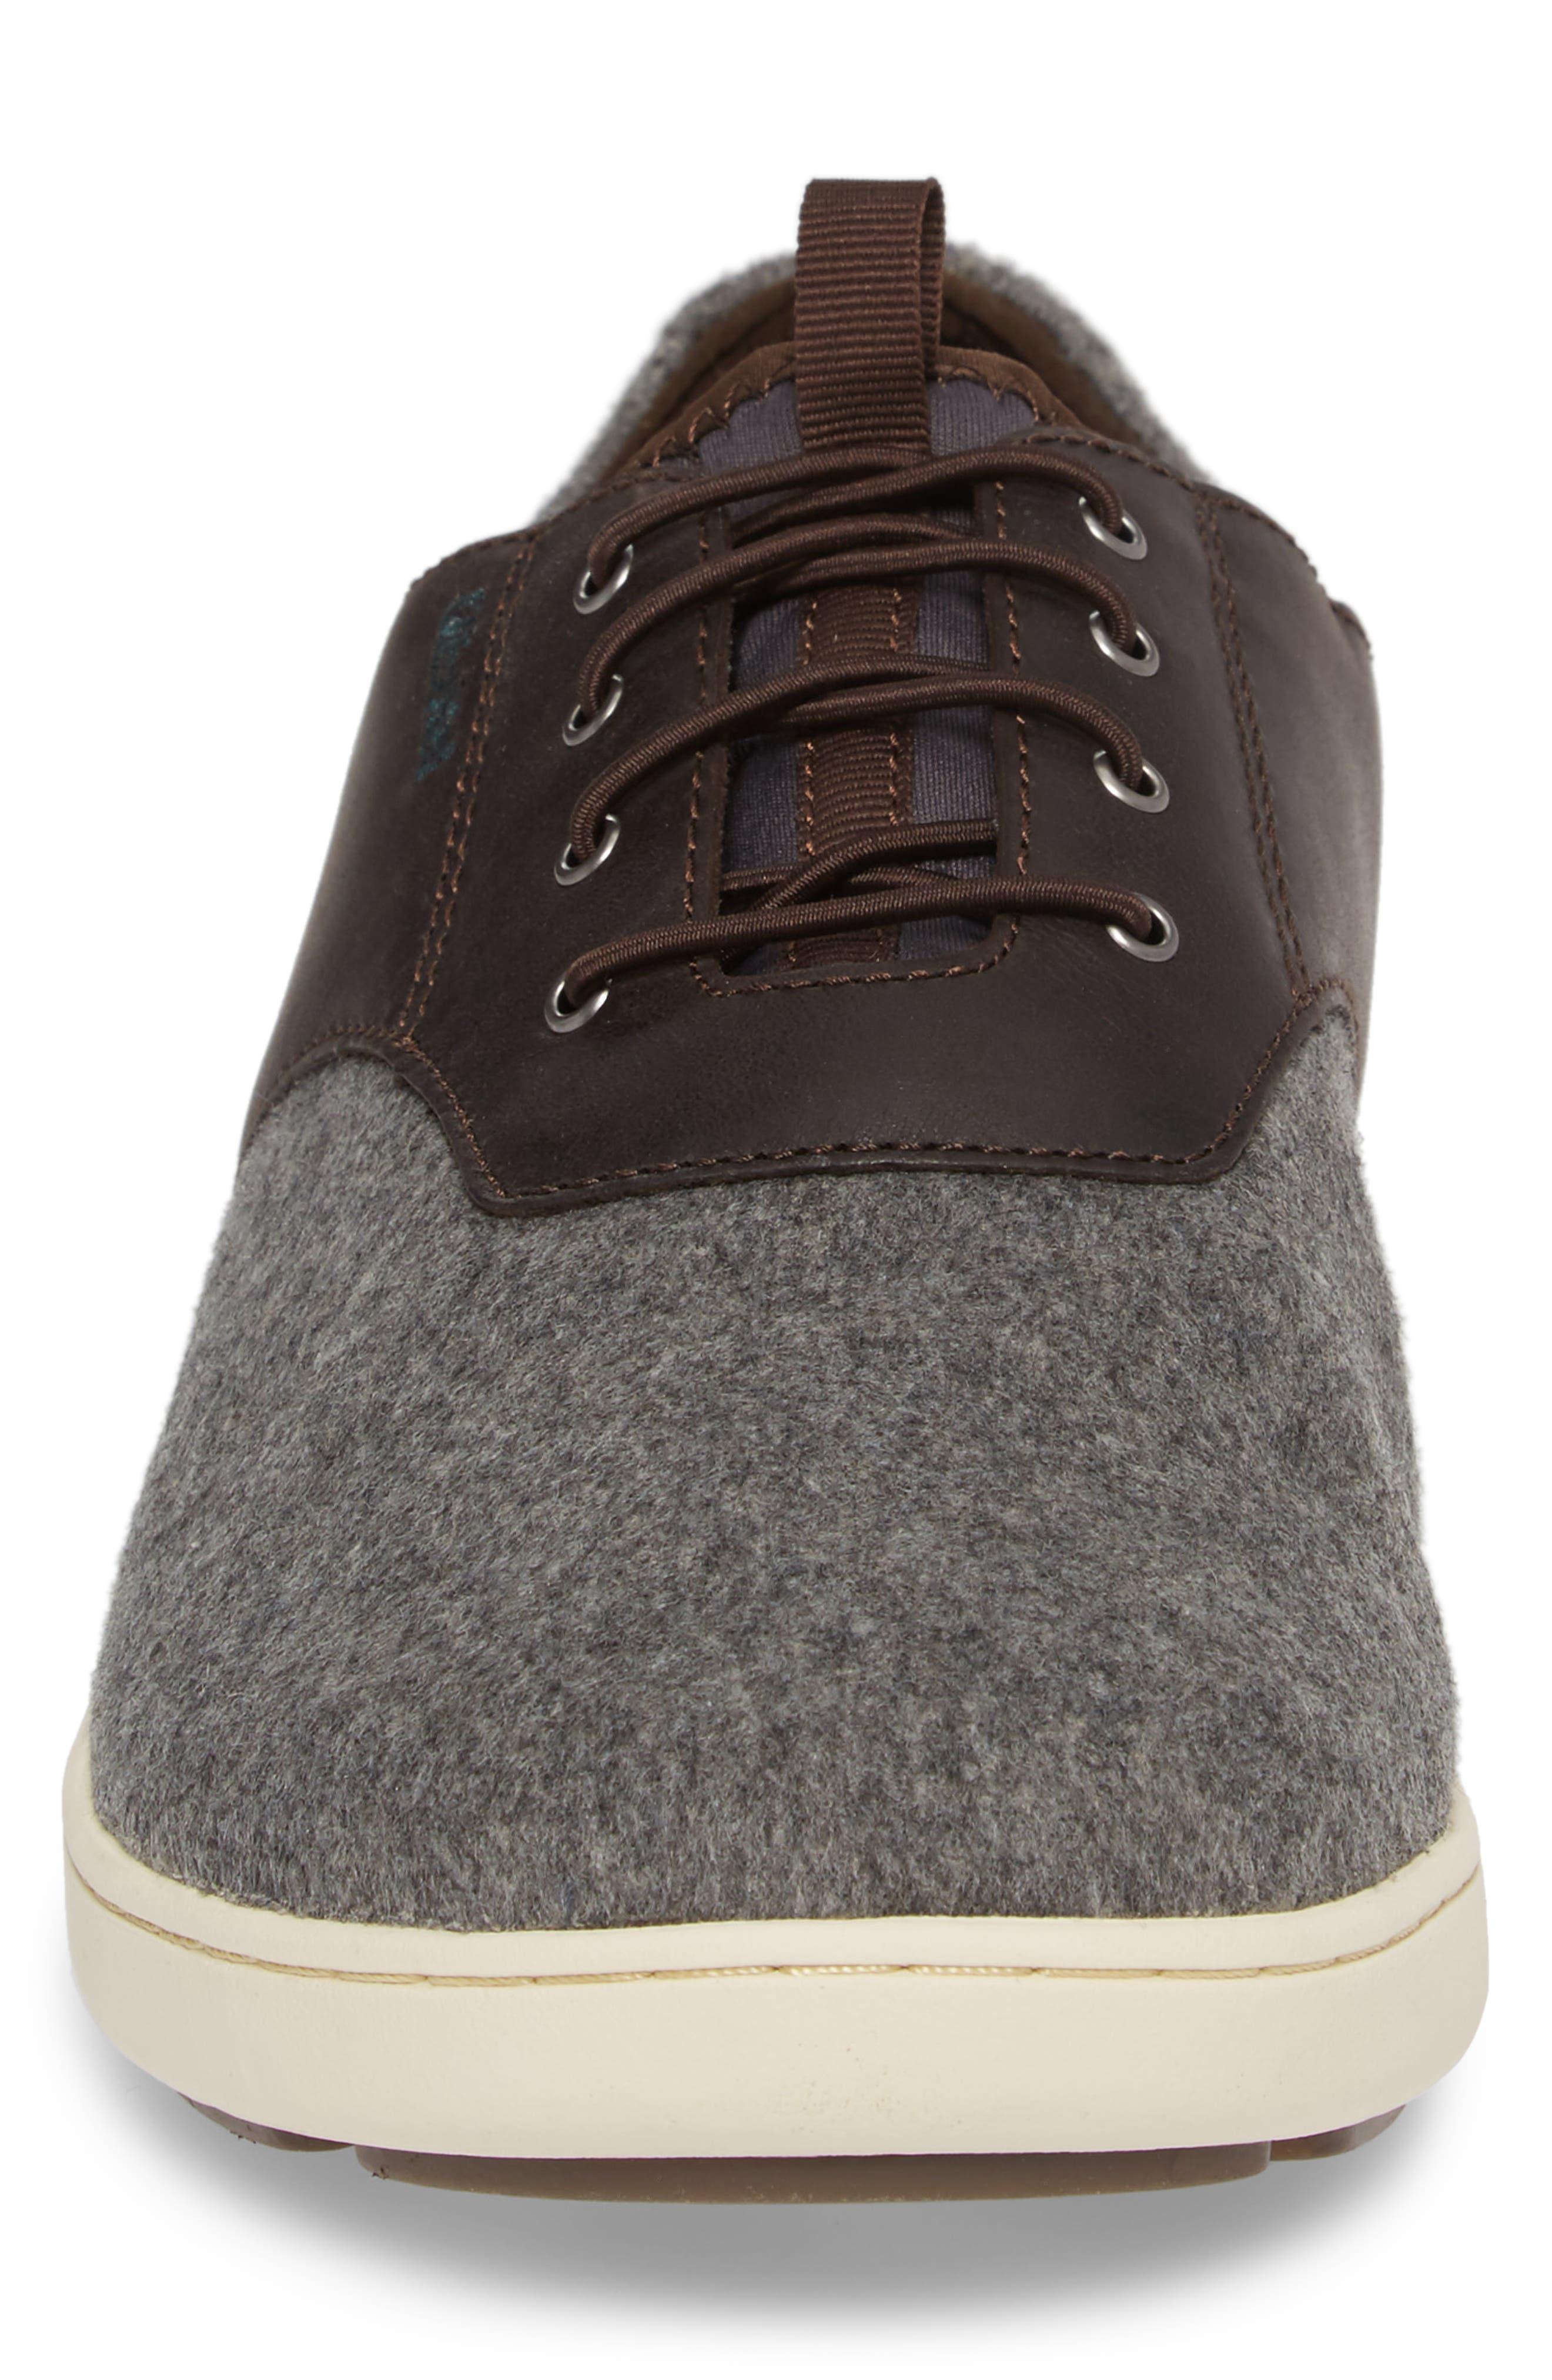 Nohea Moku Hulu Sneaker,                             Alternate thumbnail 4, color,                             Dark Roast/ Charcoal Wool